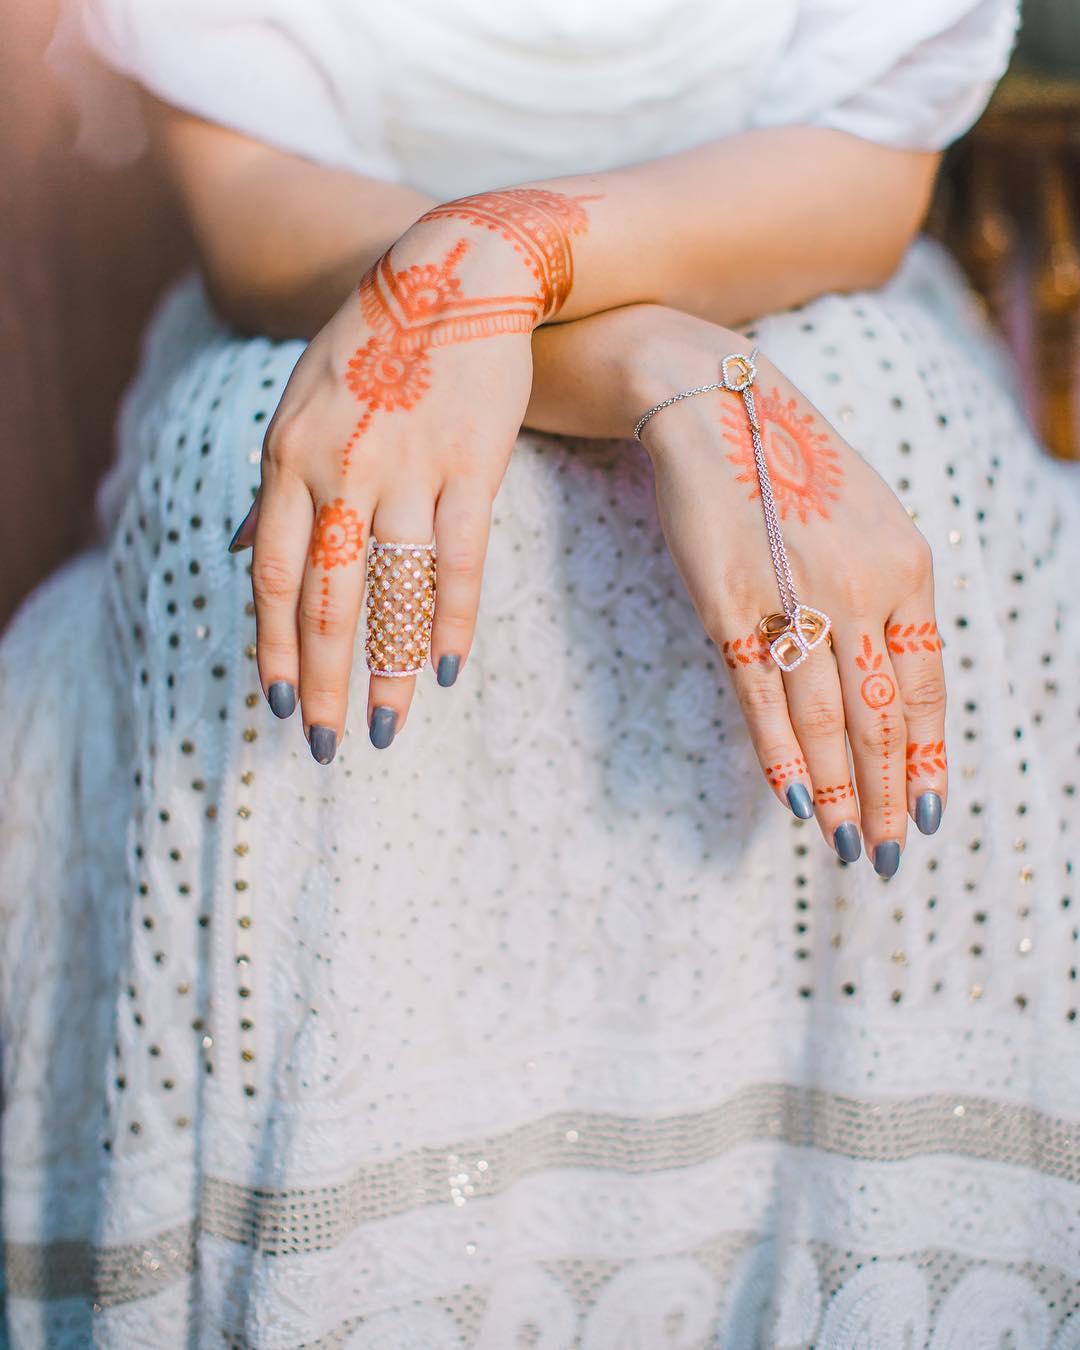 Simple Bridal Mehendi Designs For The Minimalistic Bride S Hands The Urban Guide,Spiritual Line Art Geometric Tattoo Designs